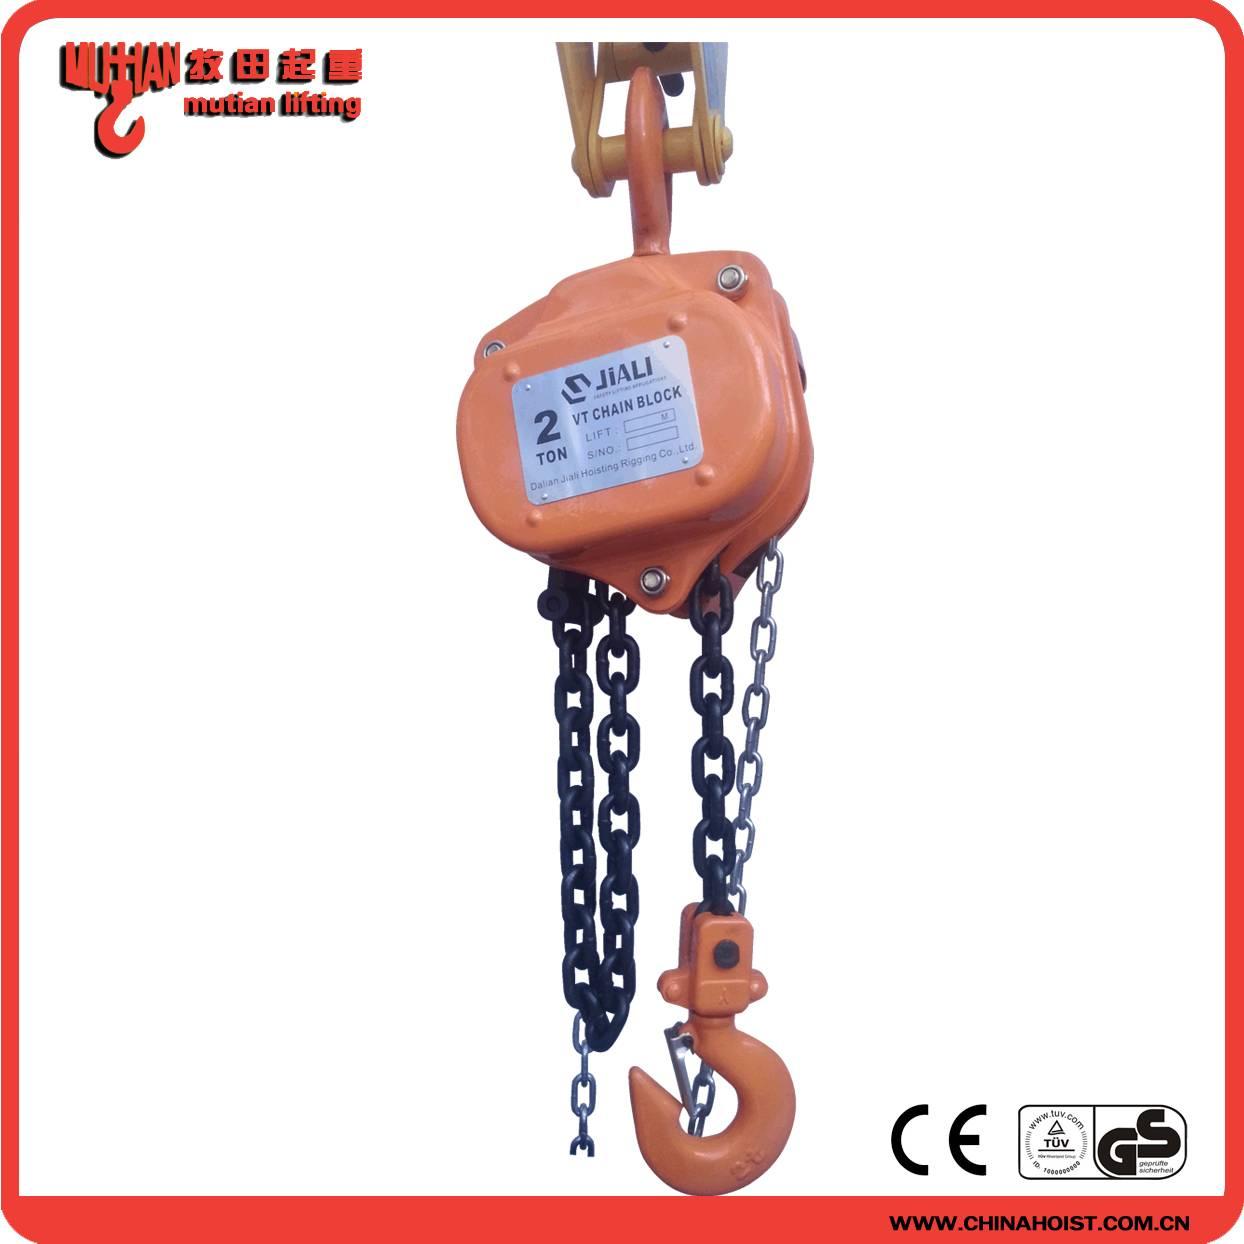 2T VT type manual hand chain hoist block hot sale